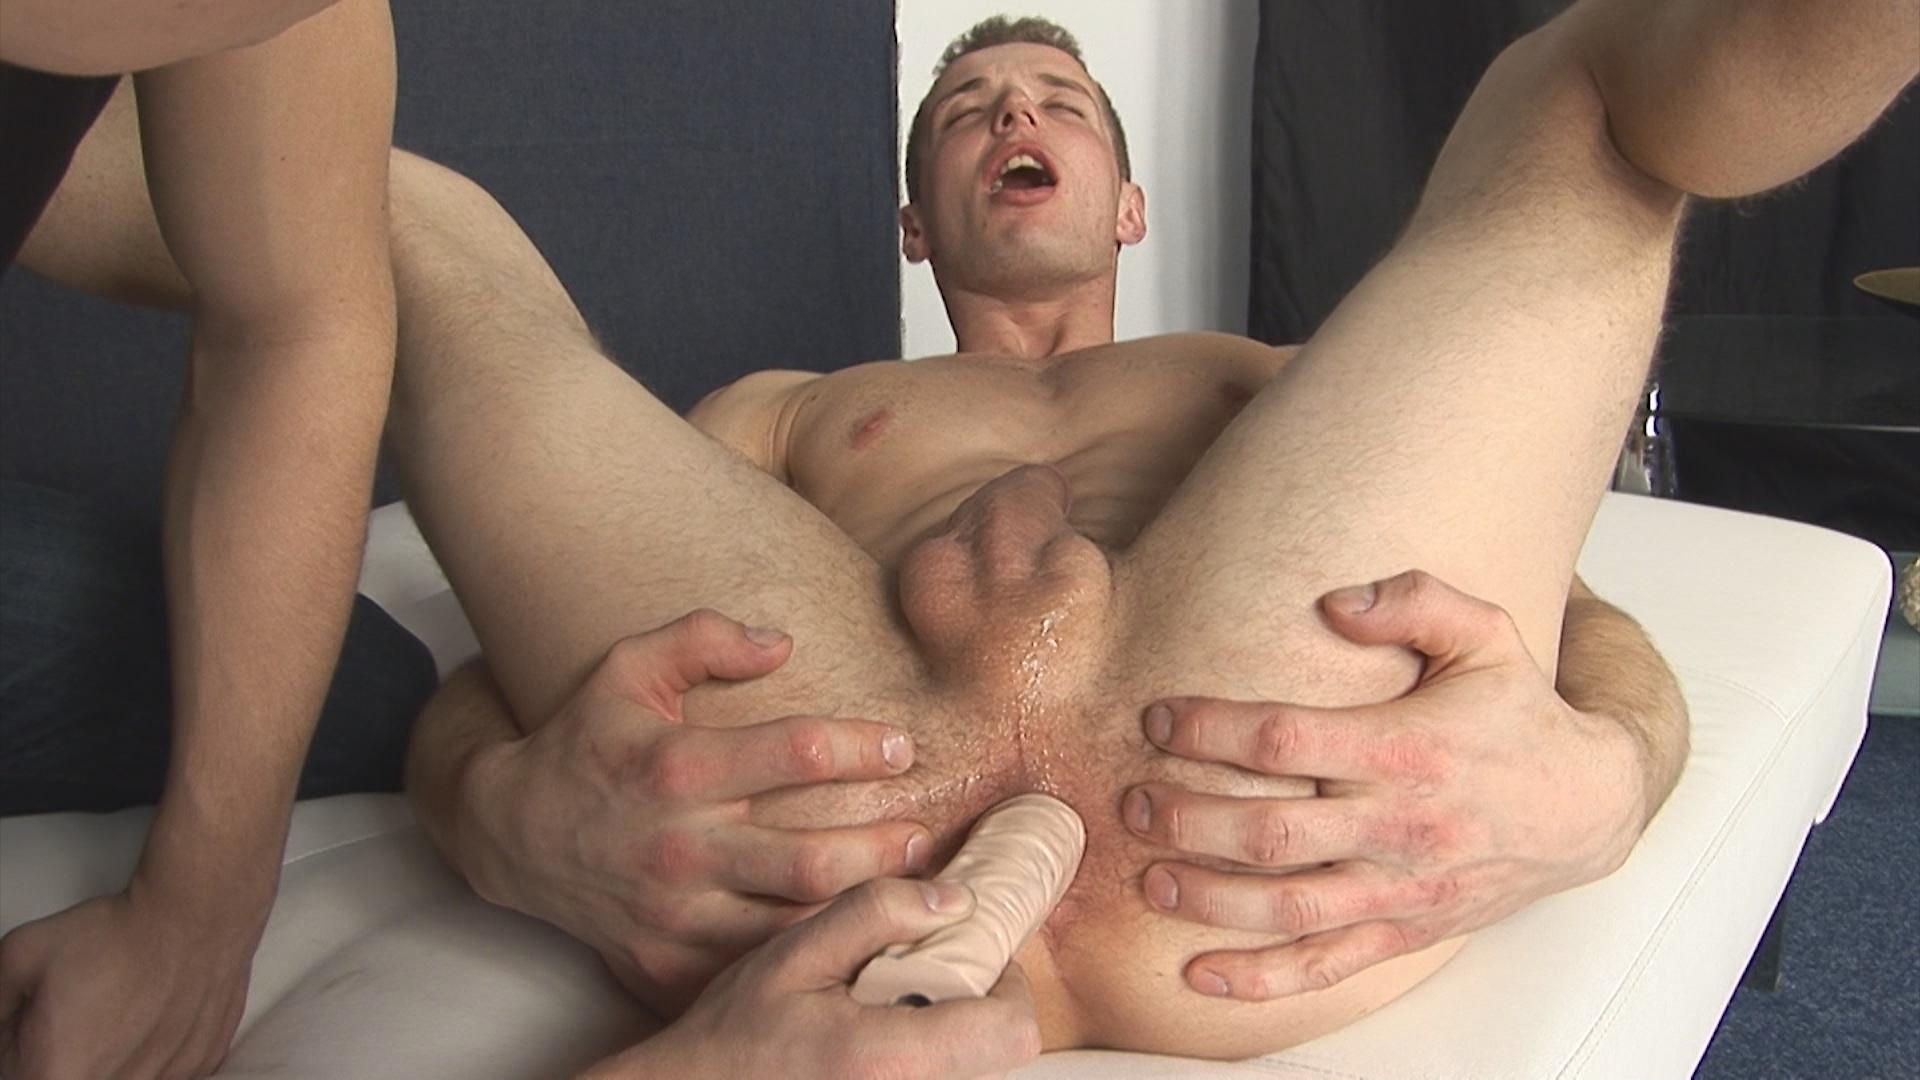 Good Gaytube - Hot Gay Boys, Sex Videos Online For Free